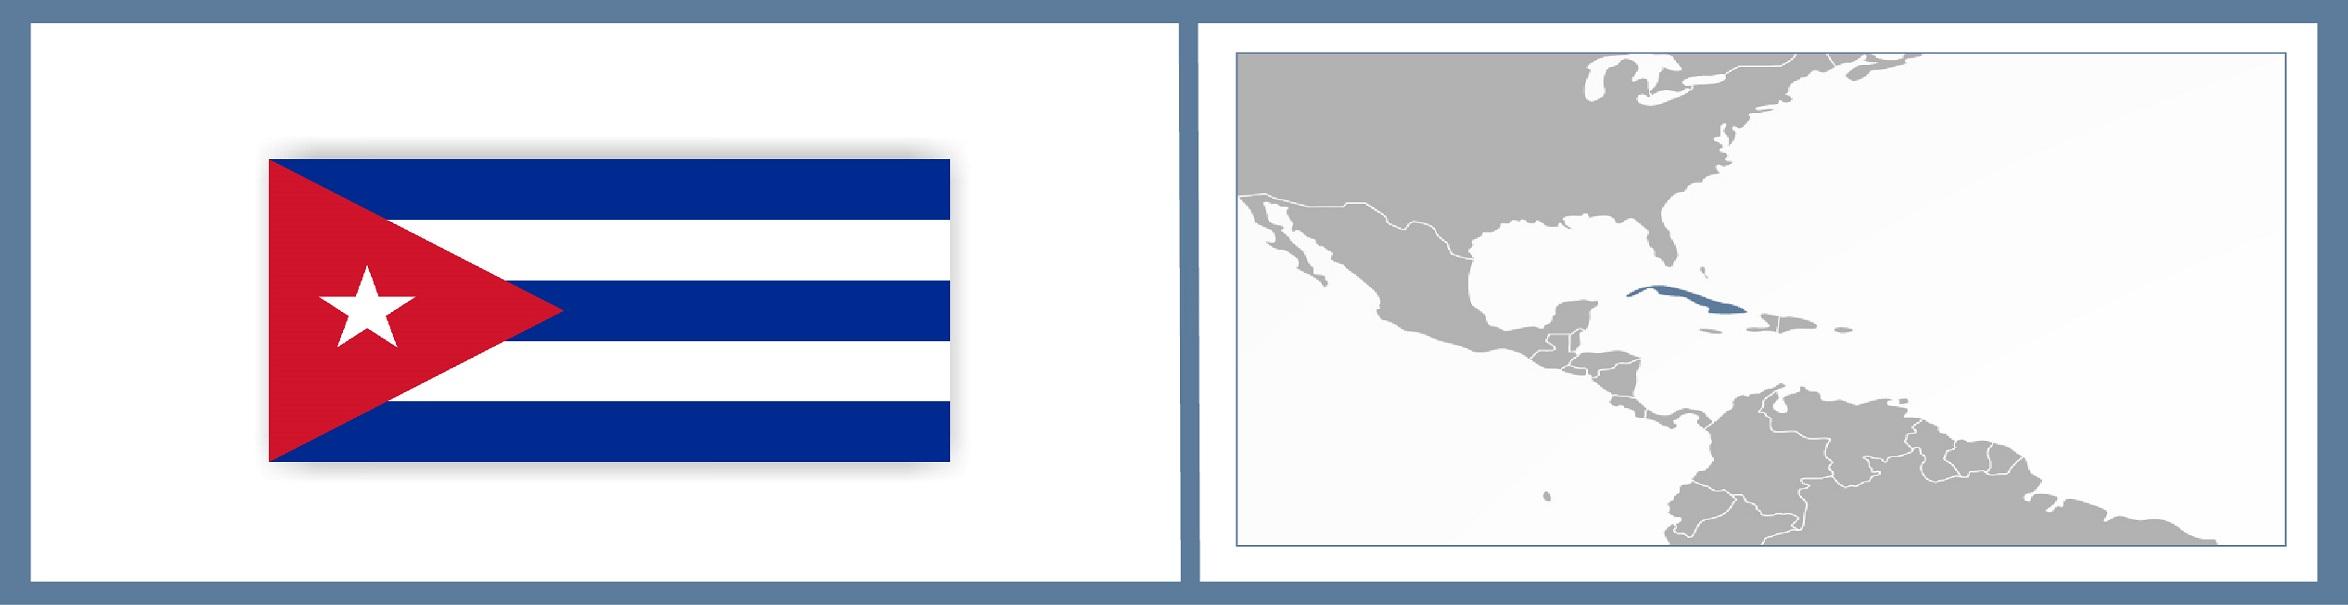 Intellectual Property in Cuba